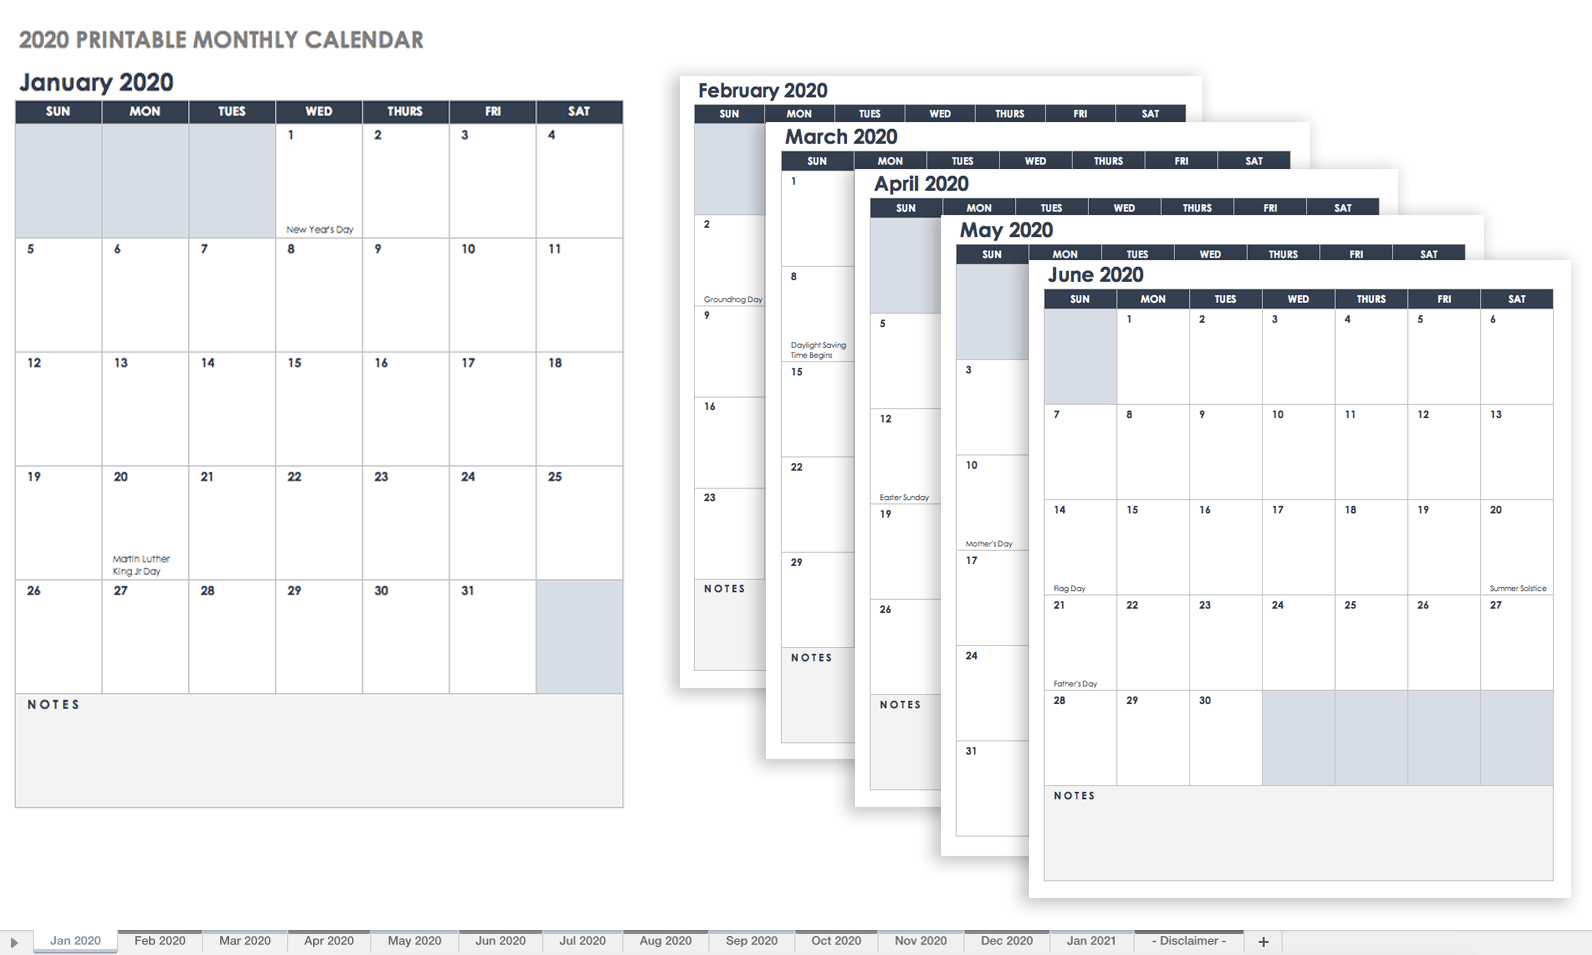 Free, Printable Excel Calendar Templates For 2019 & On | Smartsheet regarding 2019- 2020 Academic Calendar Printable Empty Boxes